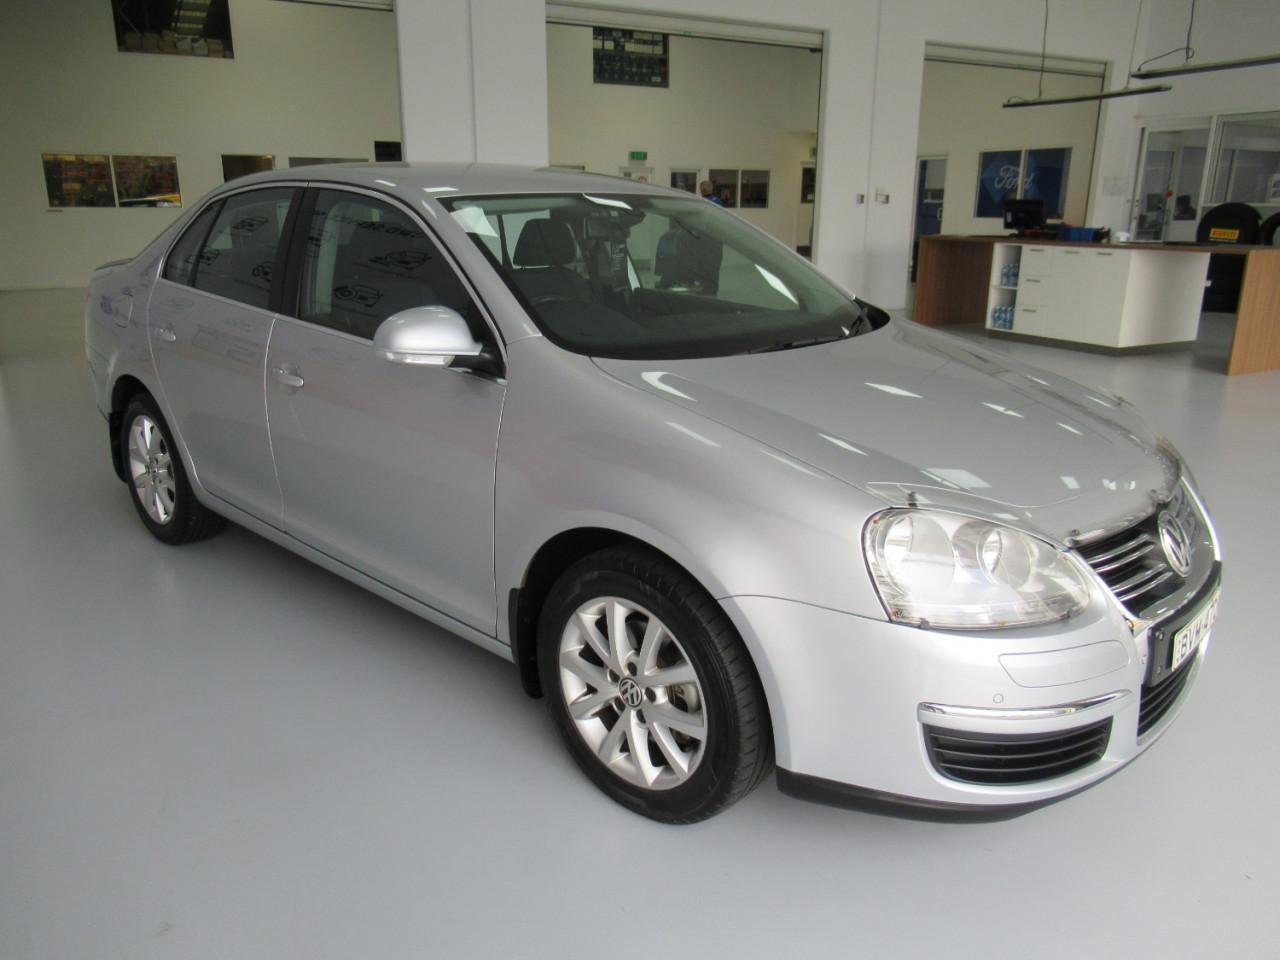 2010 Volkswagen Jetta 1KM MY10 103TDI Sedan Image 4